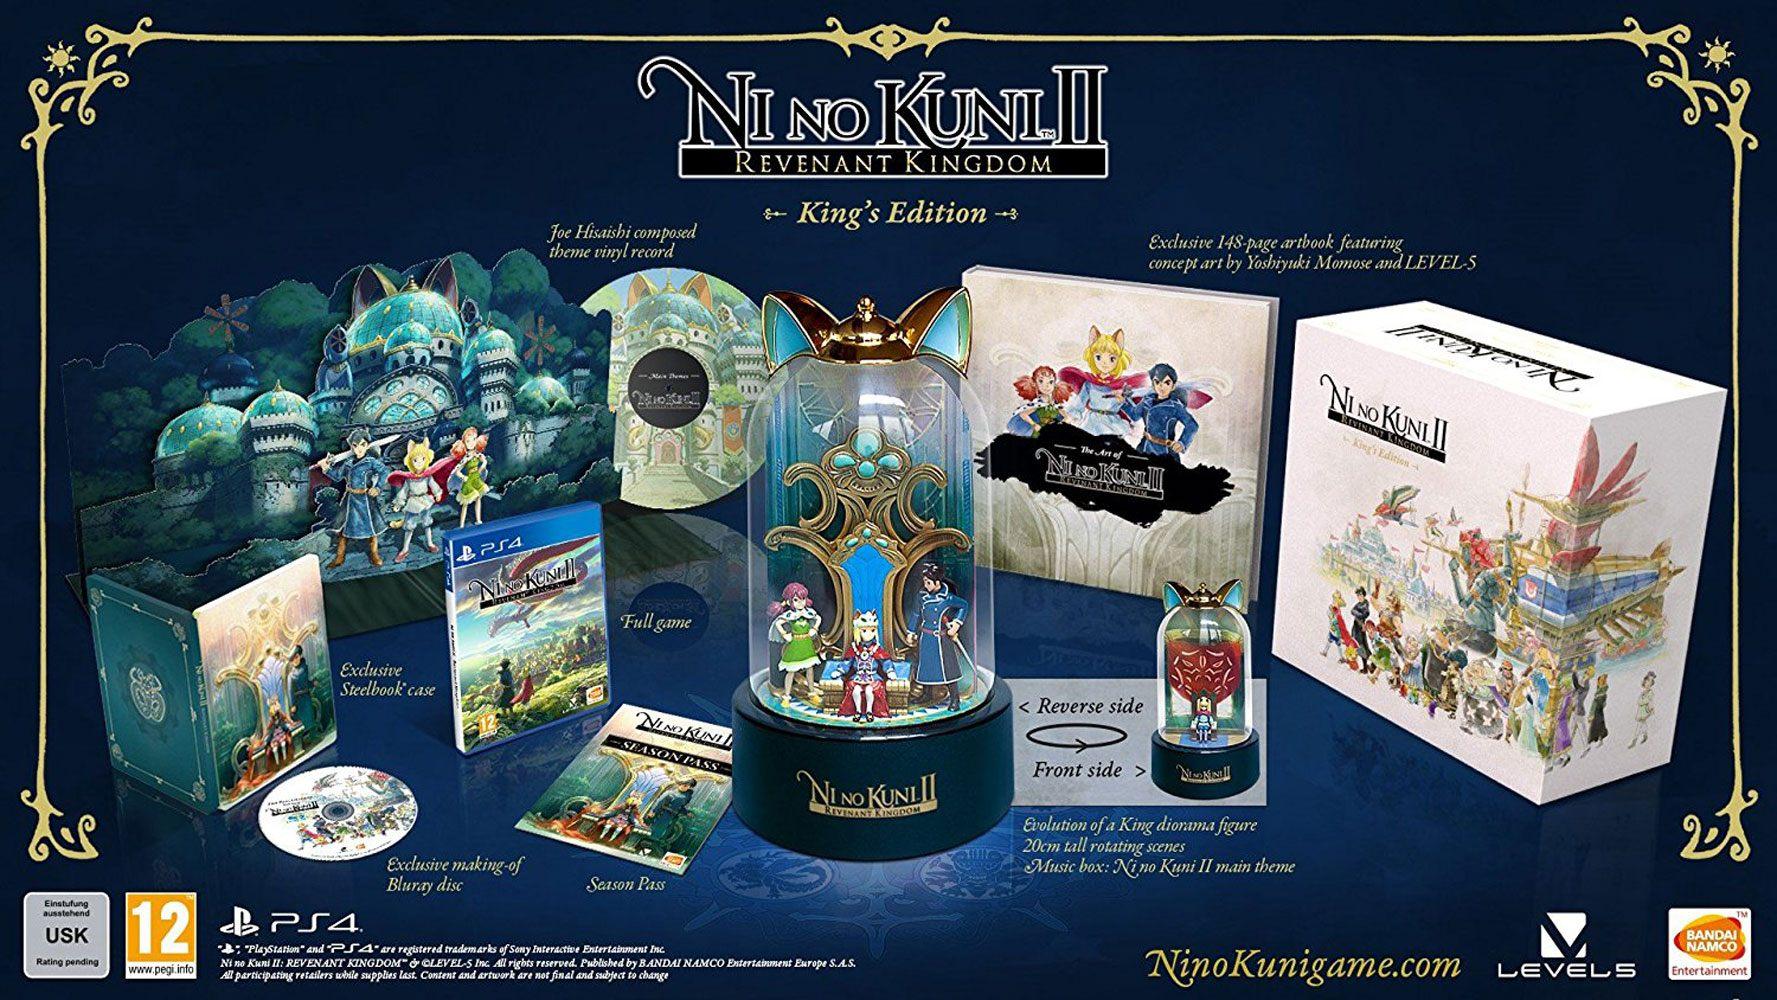 Ni No Kuni 2 Revenant Kingdom King's Edition PS4 Ver. (Sem jogo)